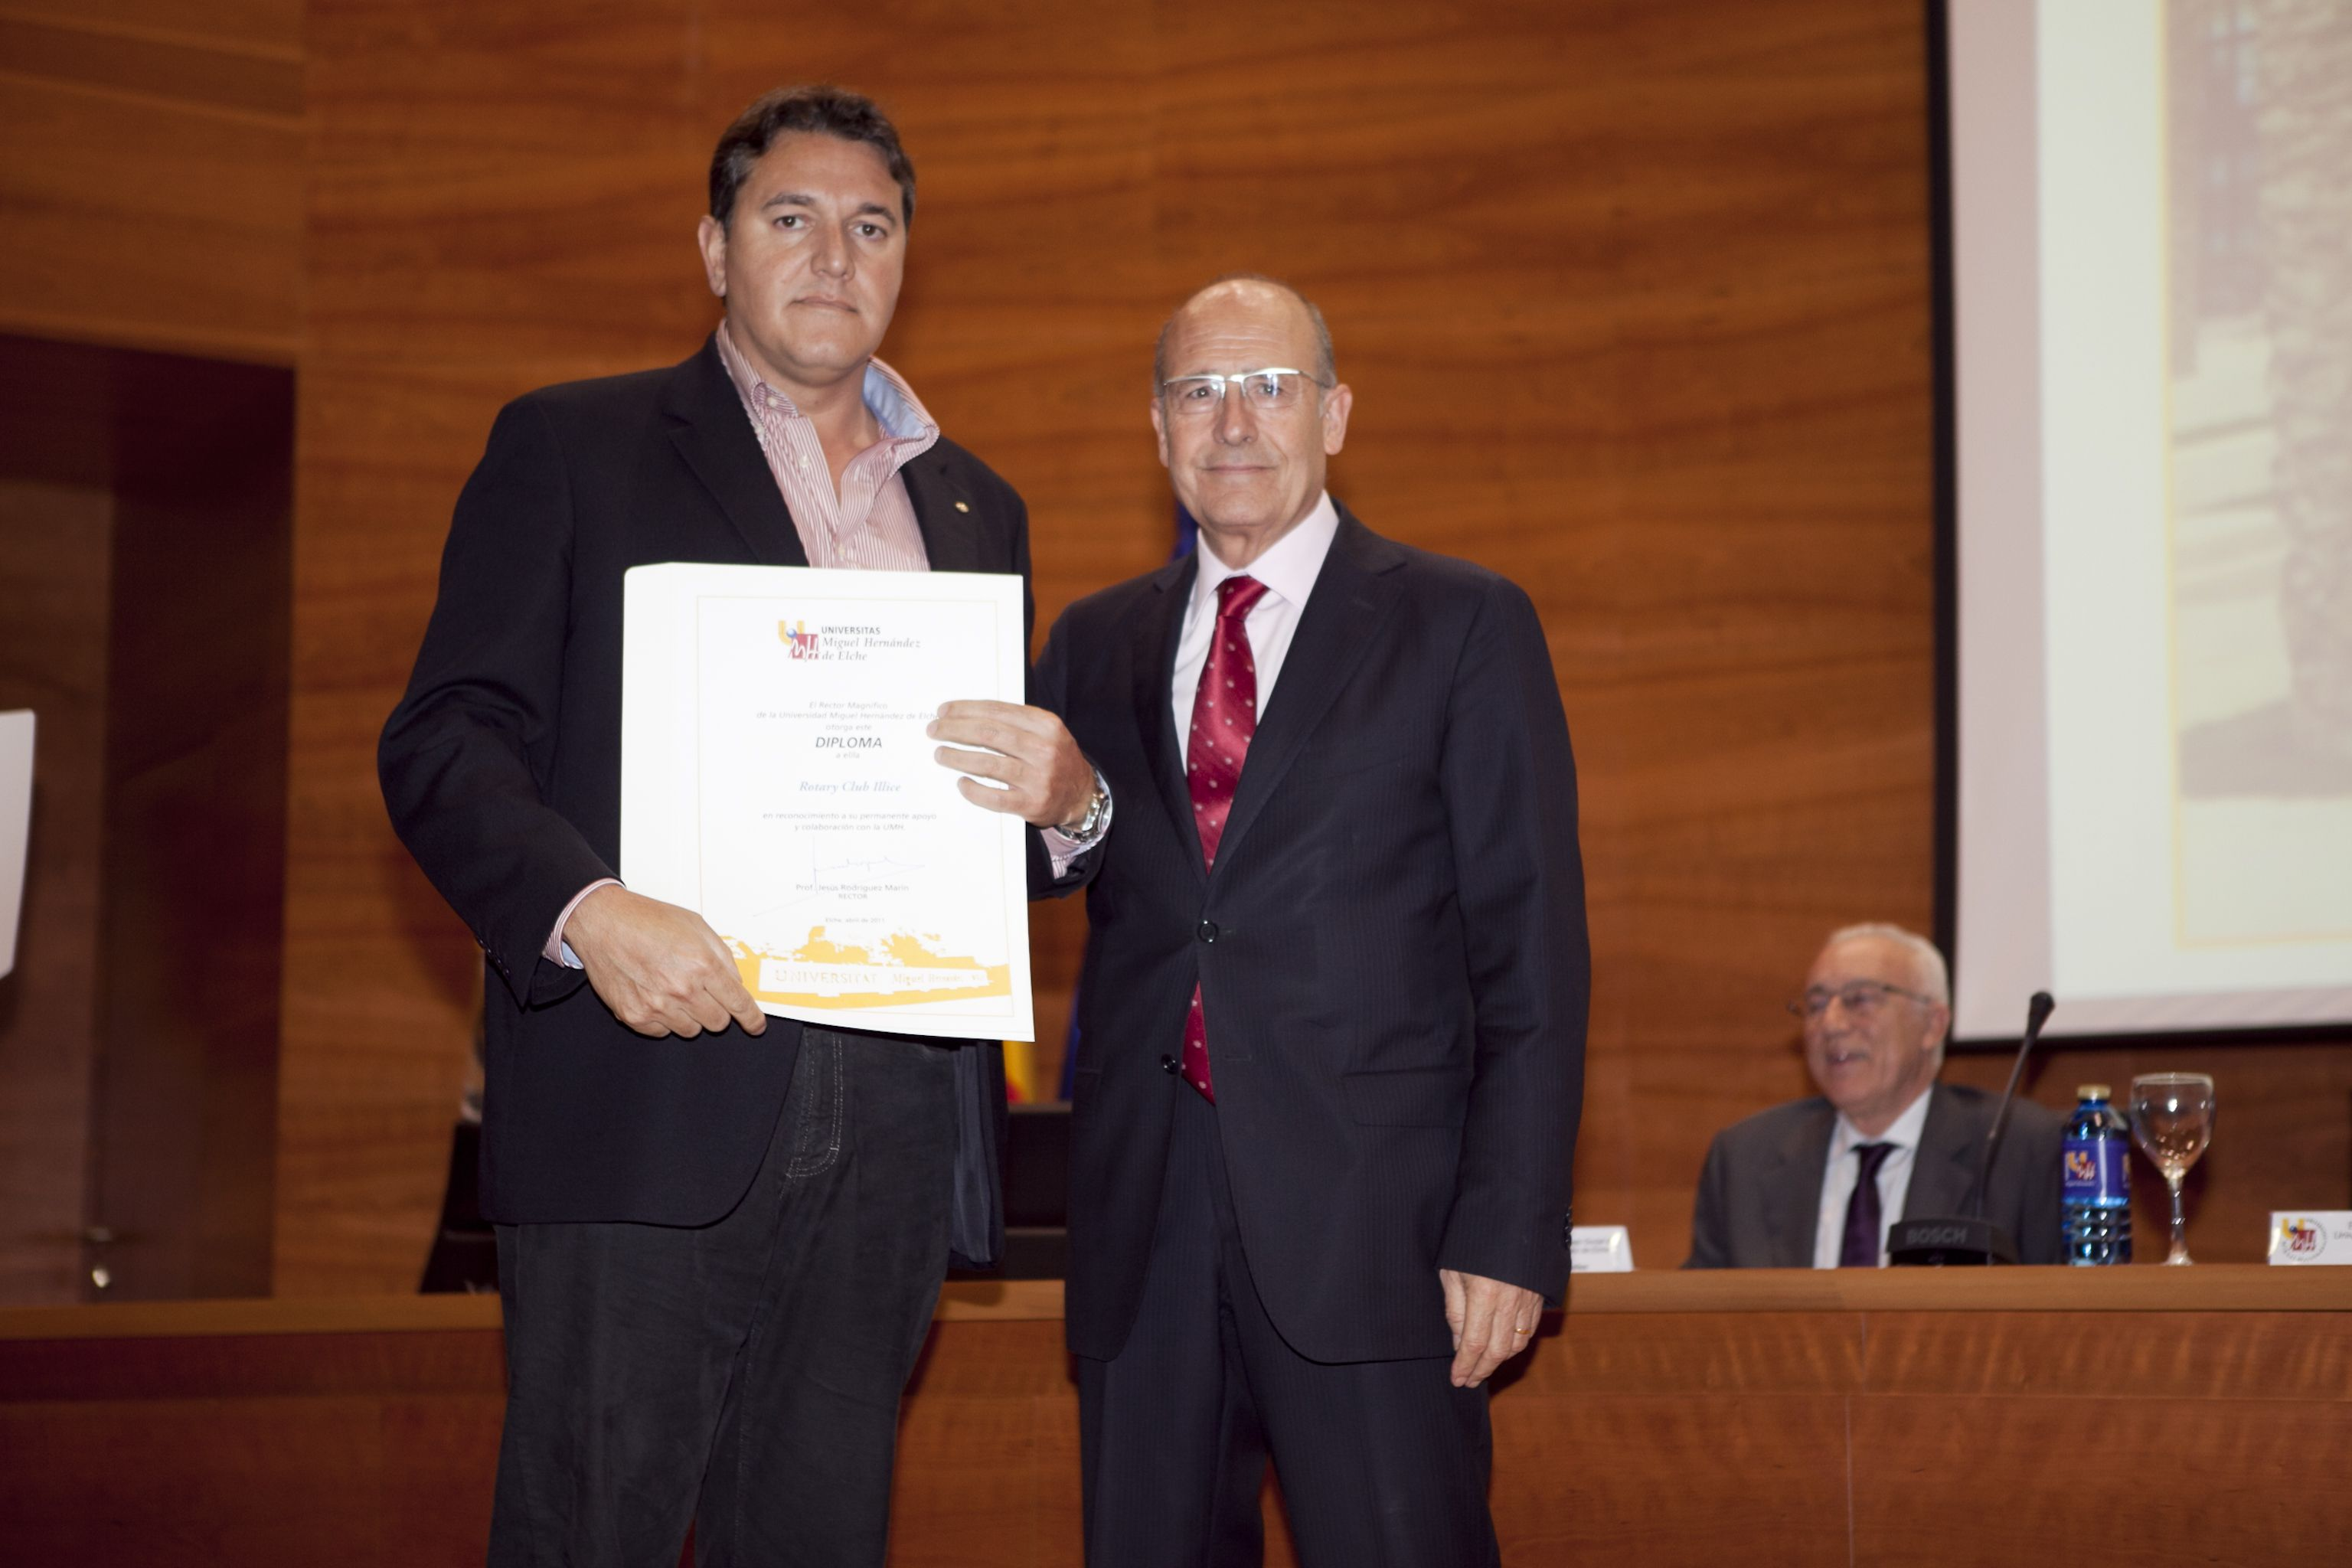 umh-diplomas-rector_mg_6529.jpg